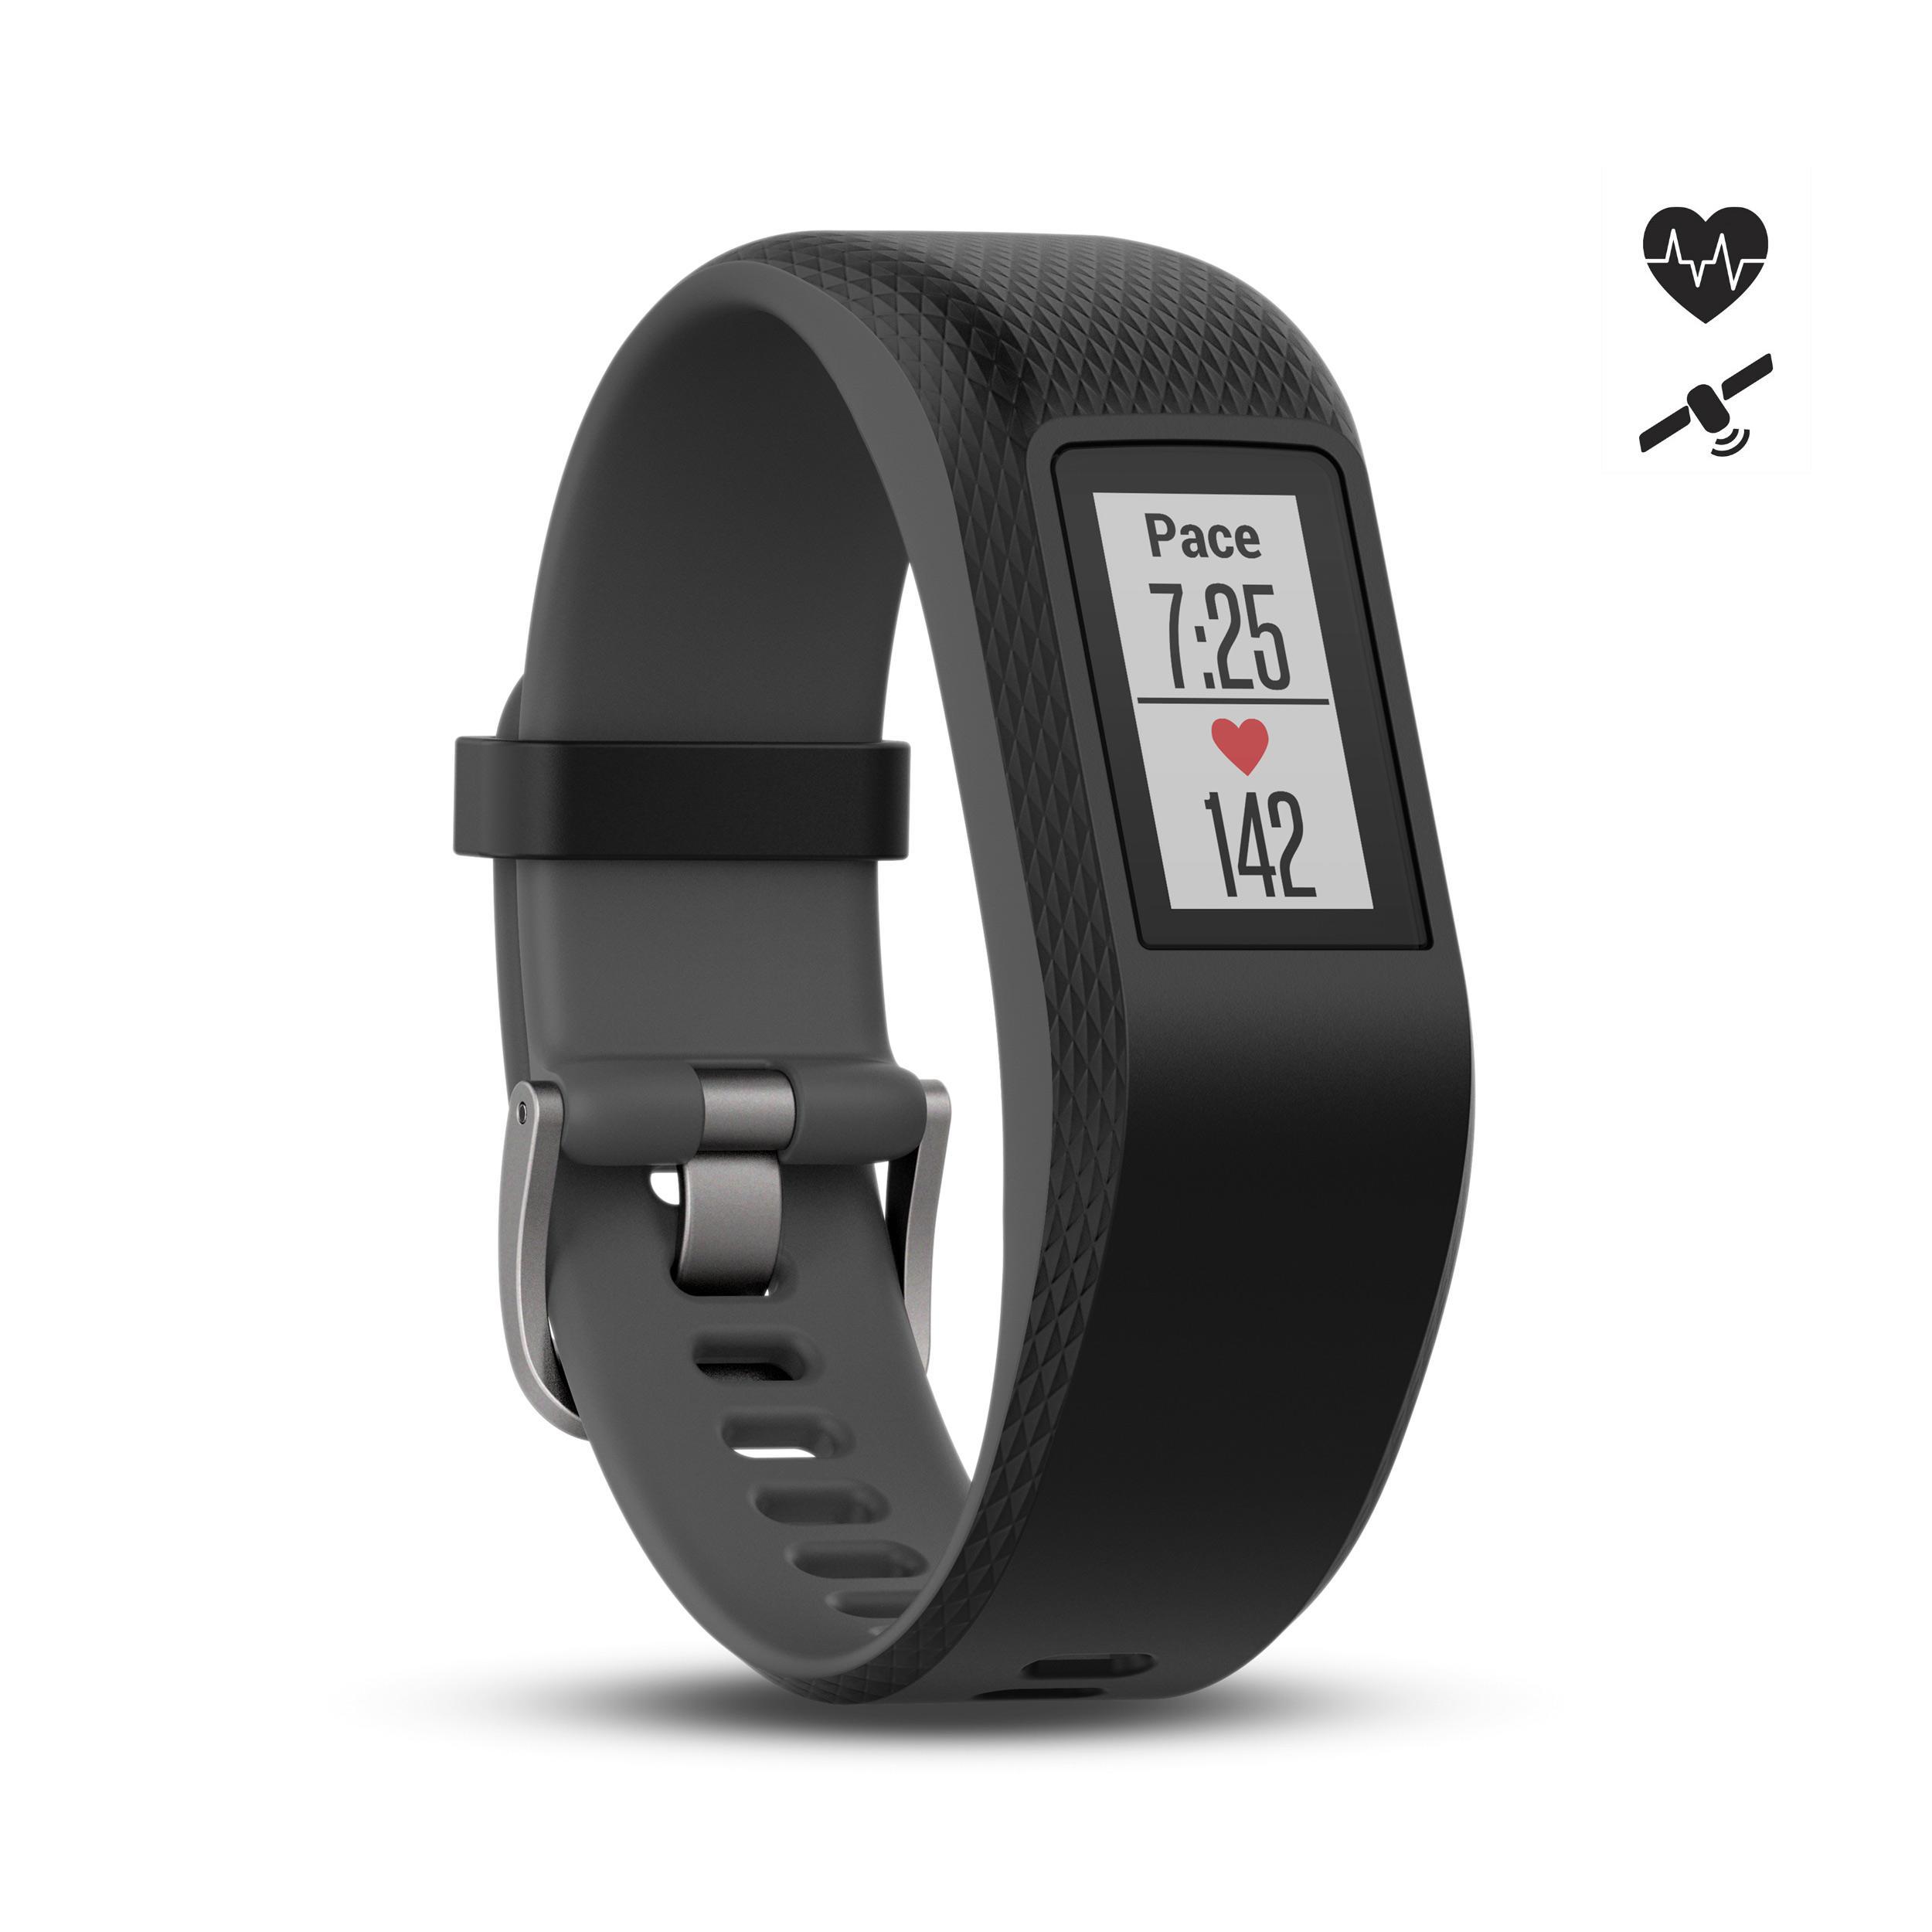 Fitnessarmband vívosport mit Herzfrequenzsensor am Handgelenk grau | Schmuck > Armbänder > Fitness-Armbänder | Garmin